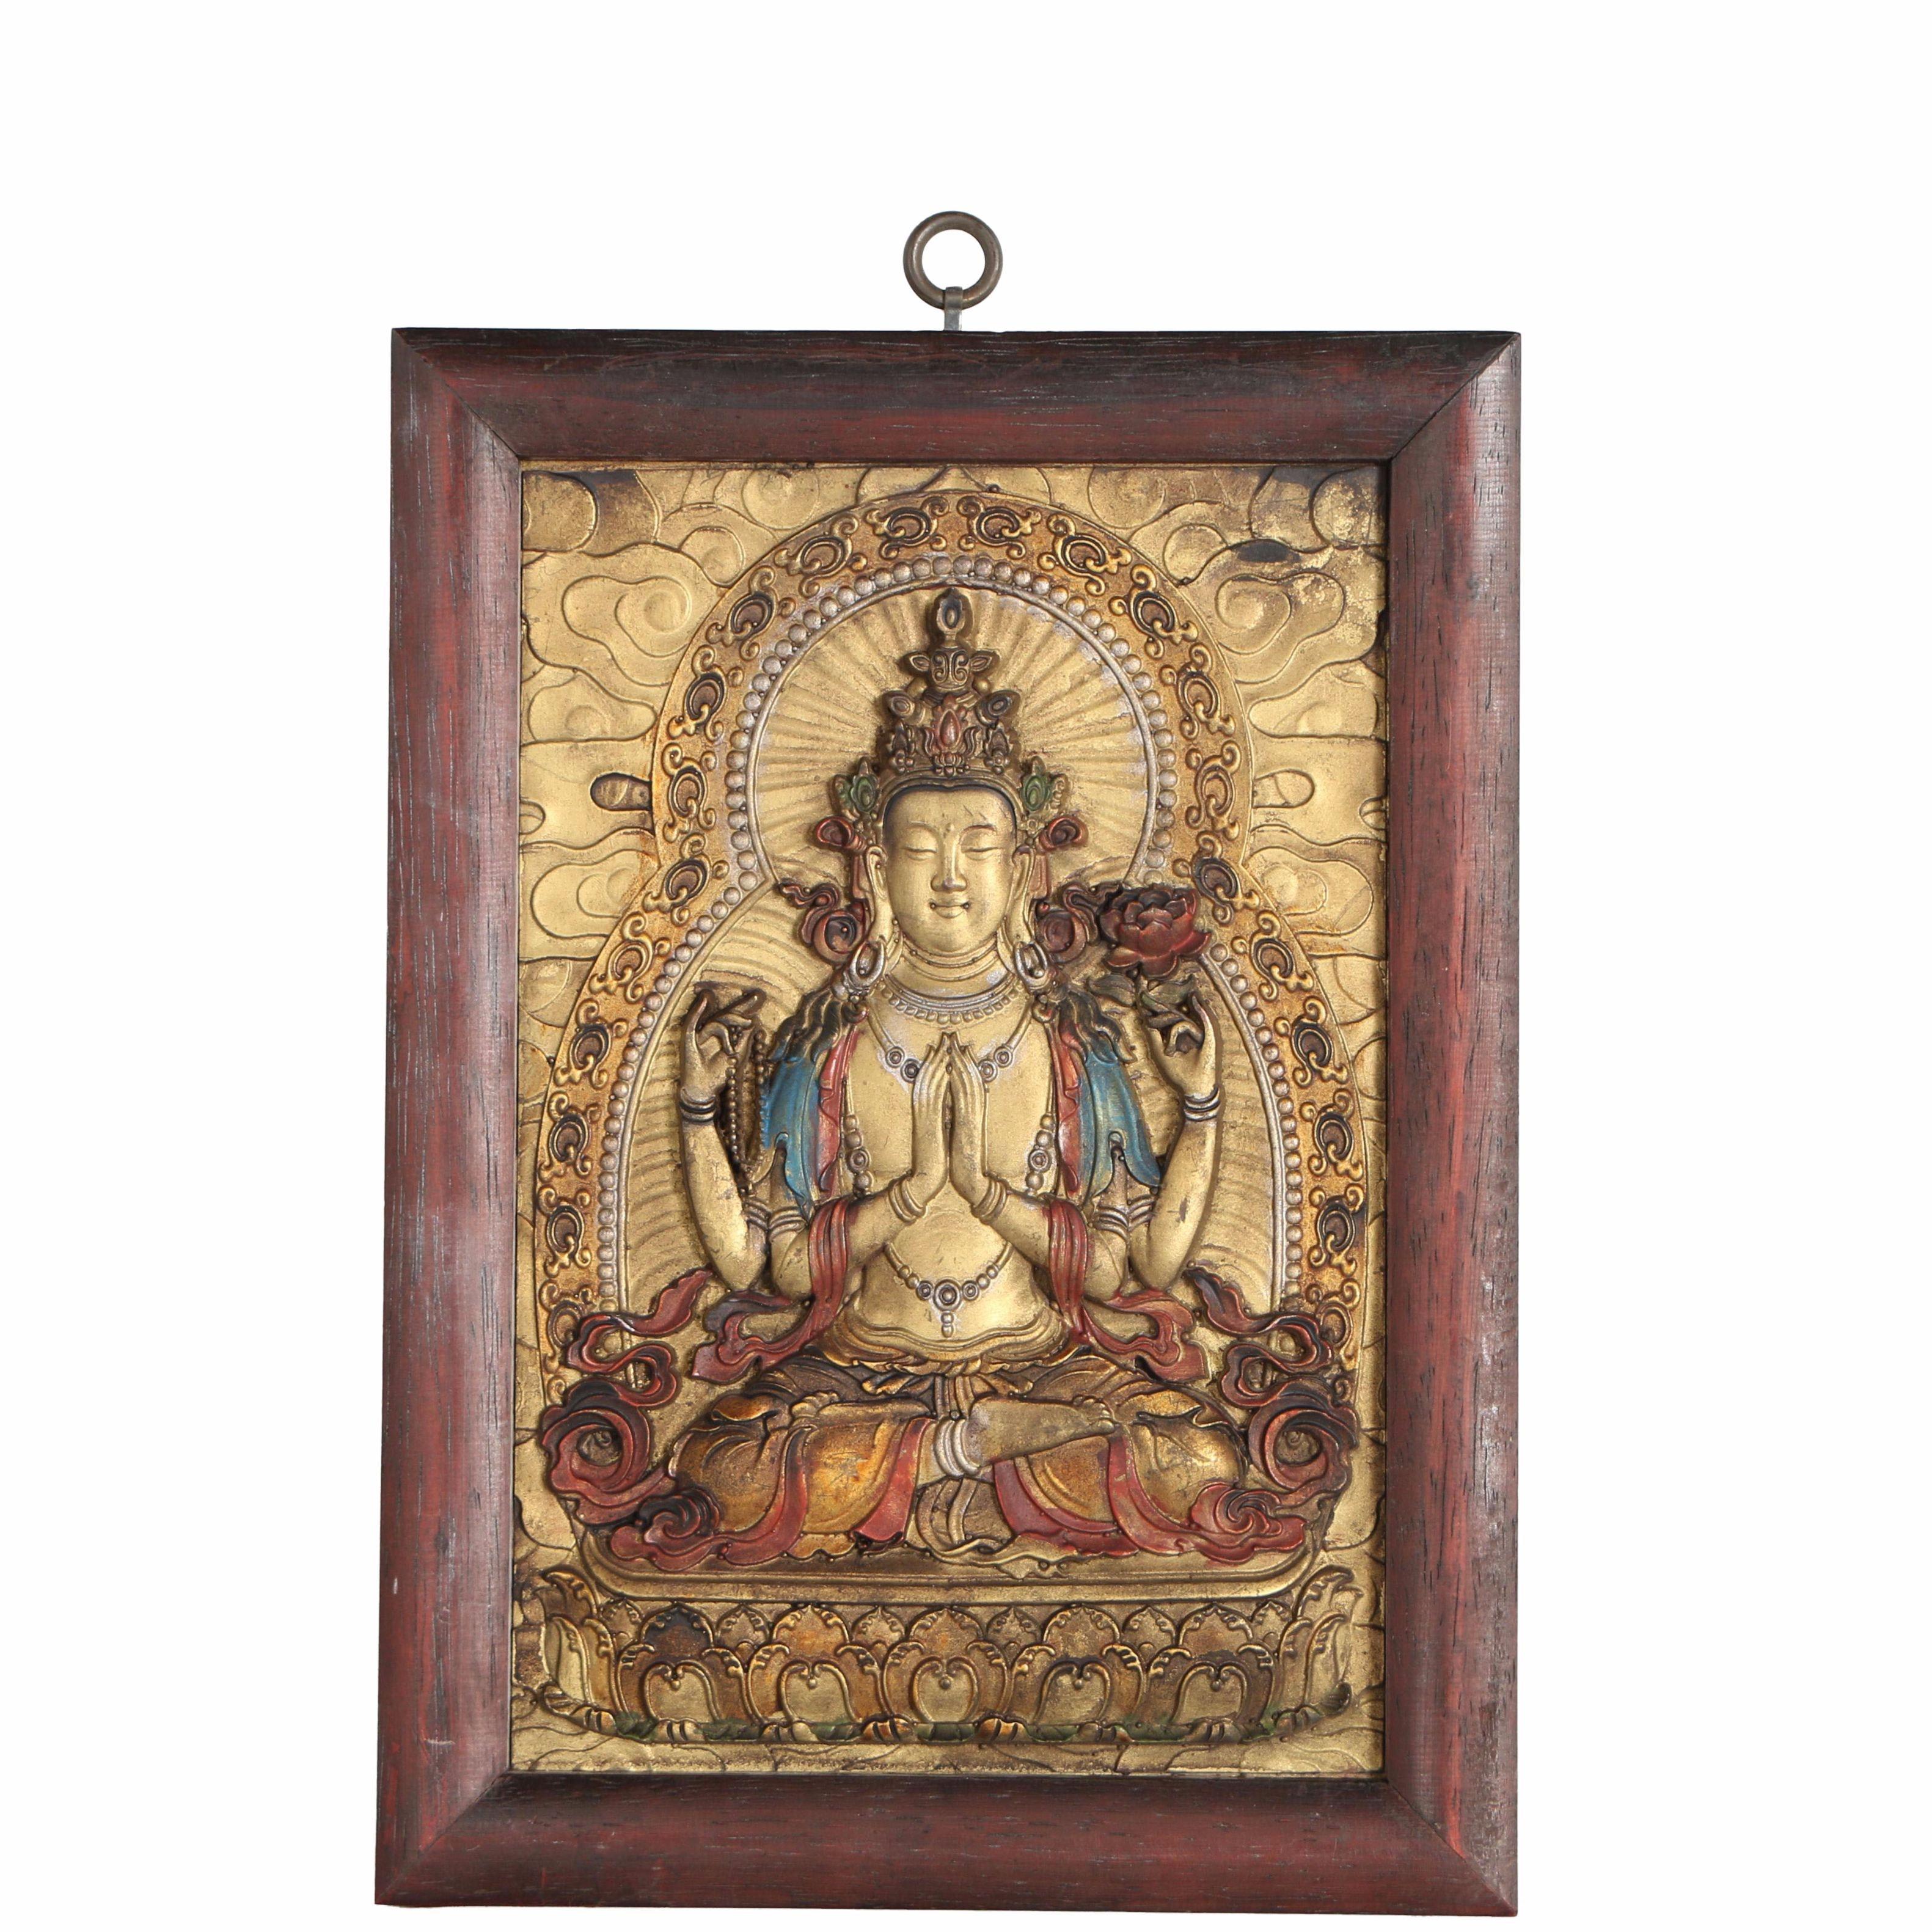 Painted Metal Sculptural Relief of Avalokiteshvara